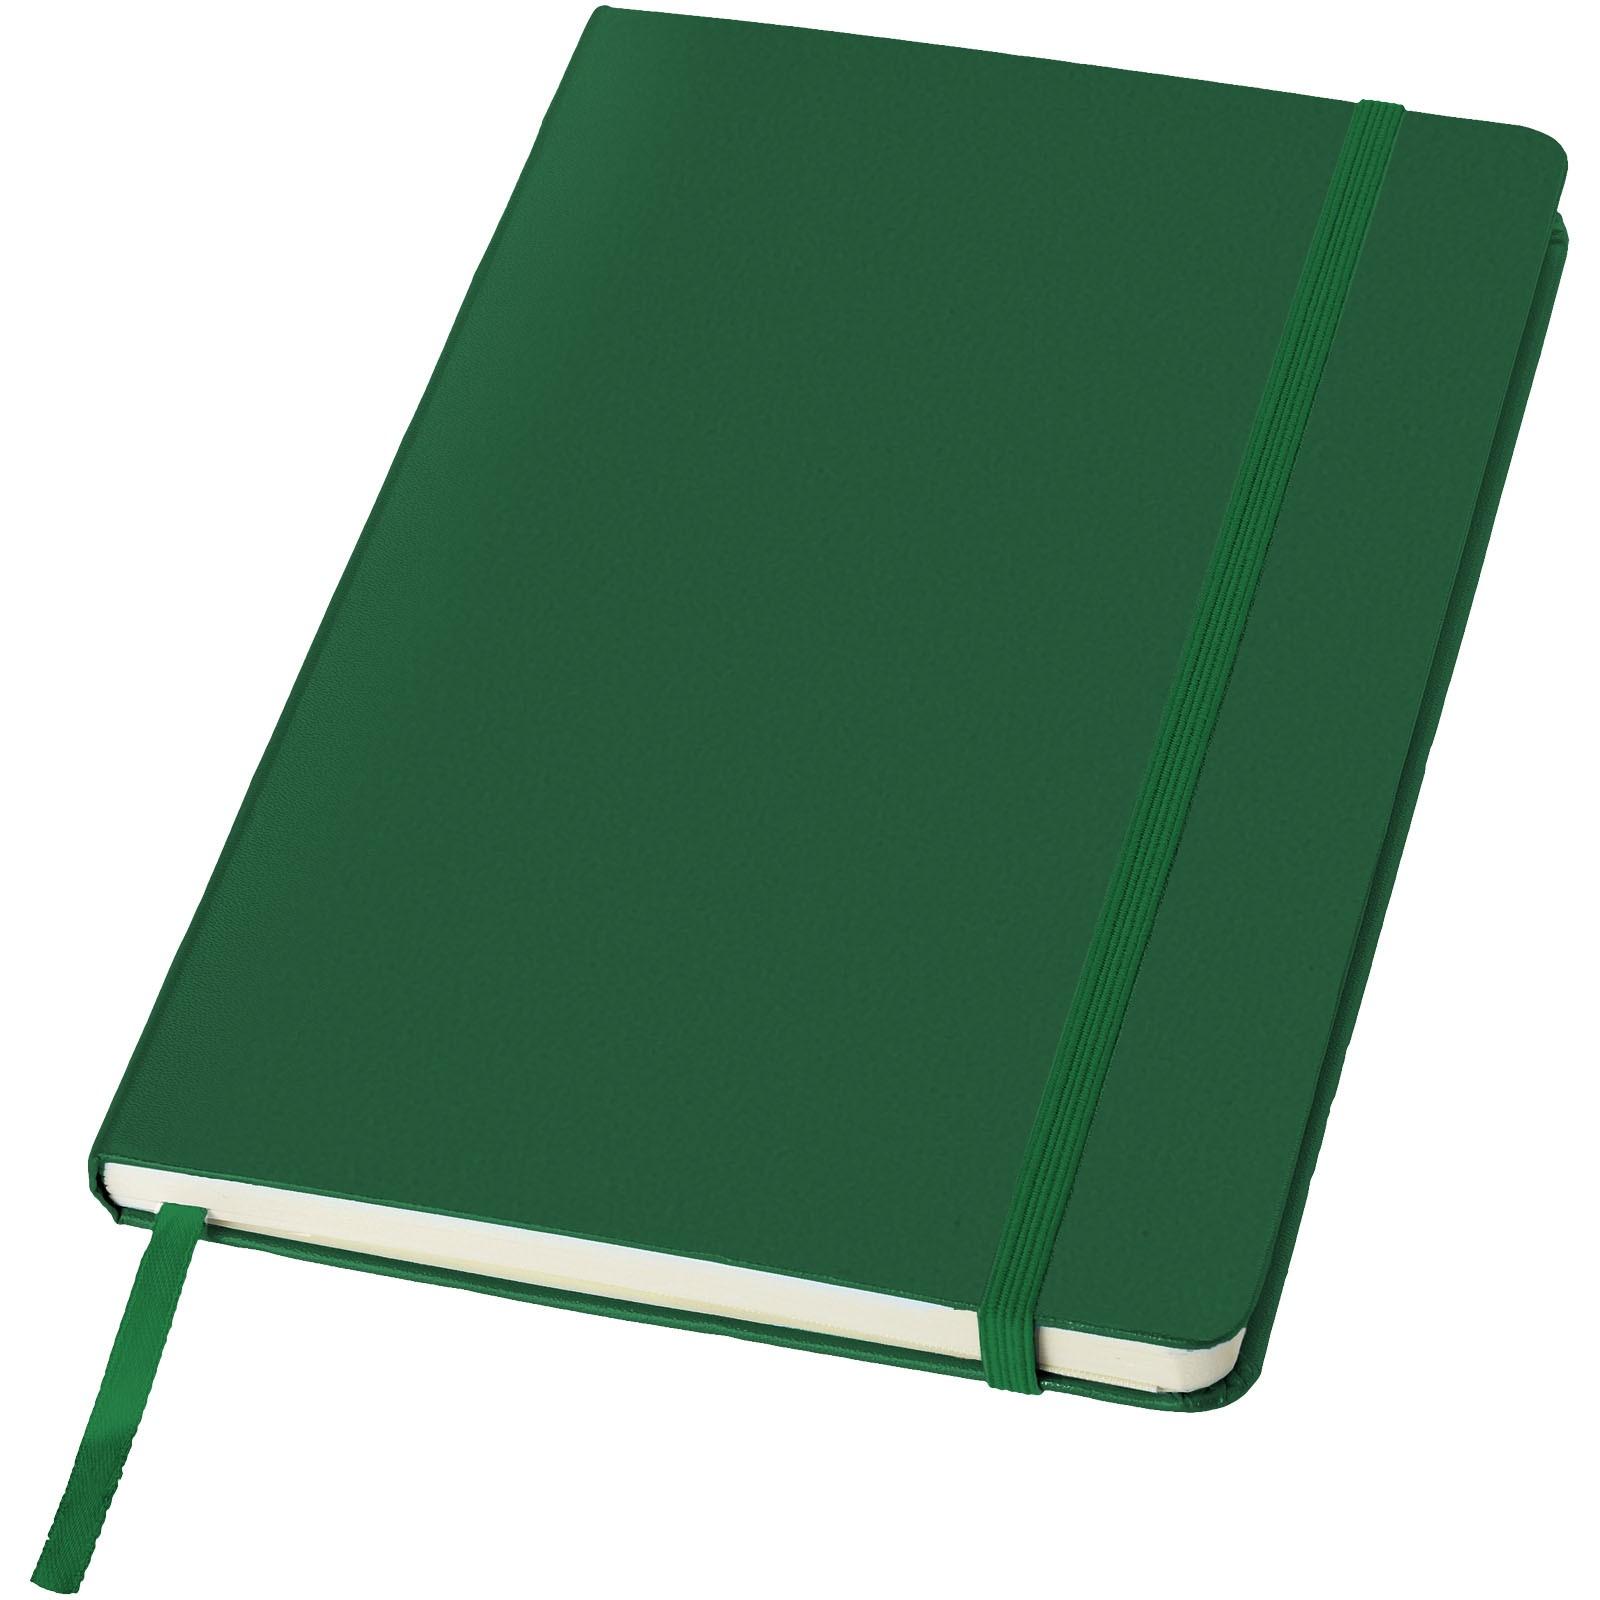 Classic A5 Hard Cover Notizbuch - jagdgrün